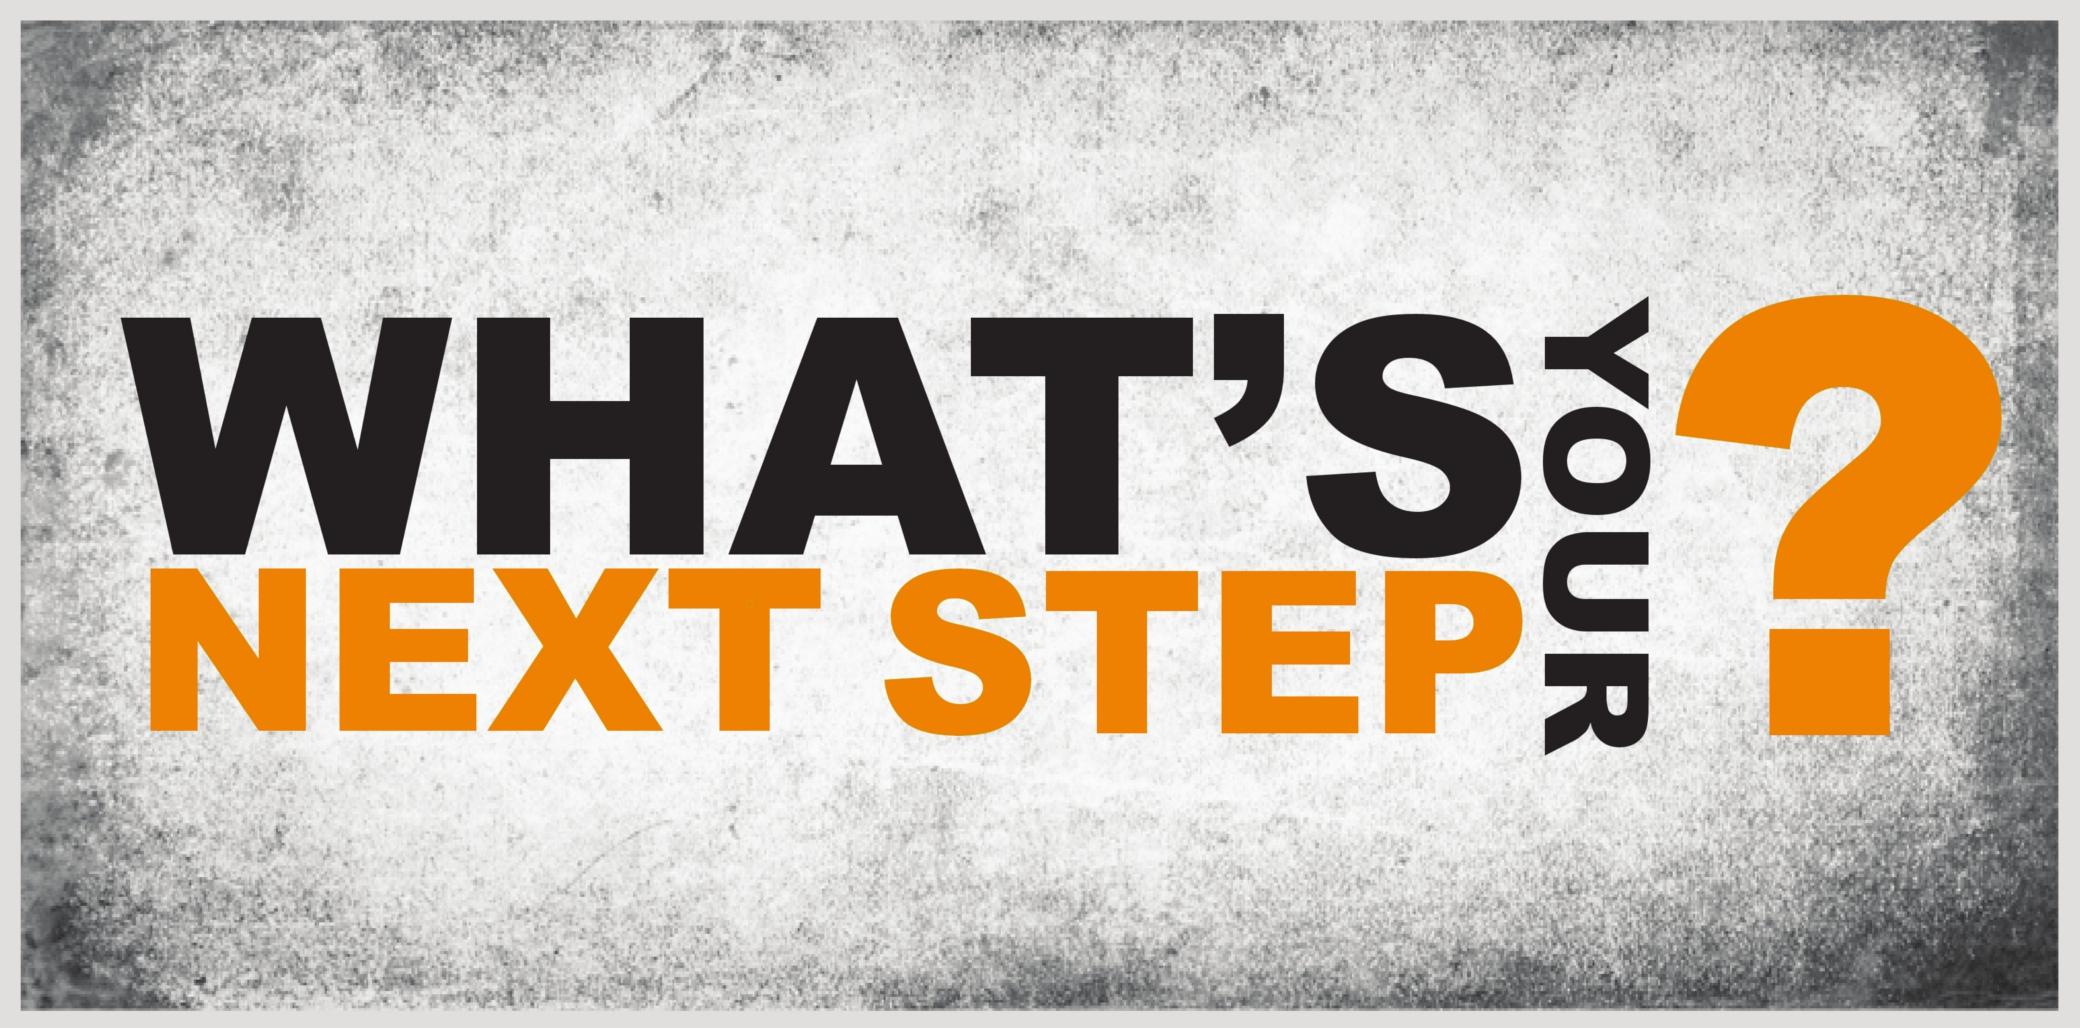 web-page-next-step.jpg